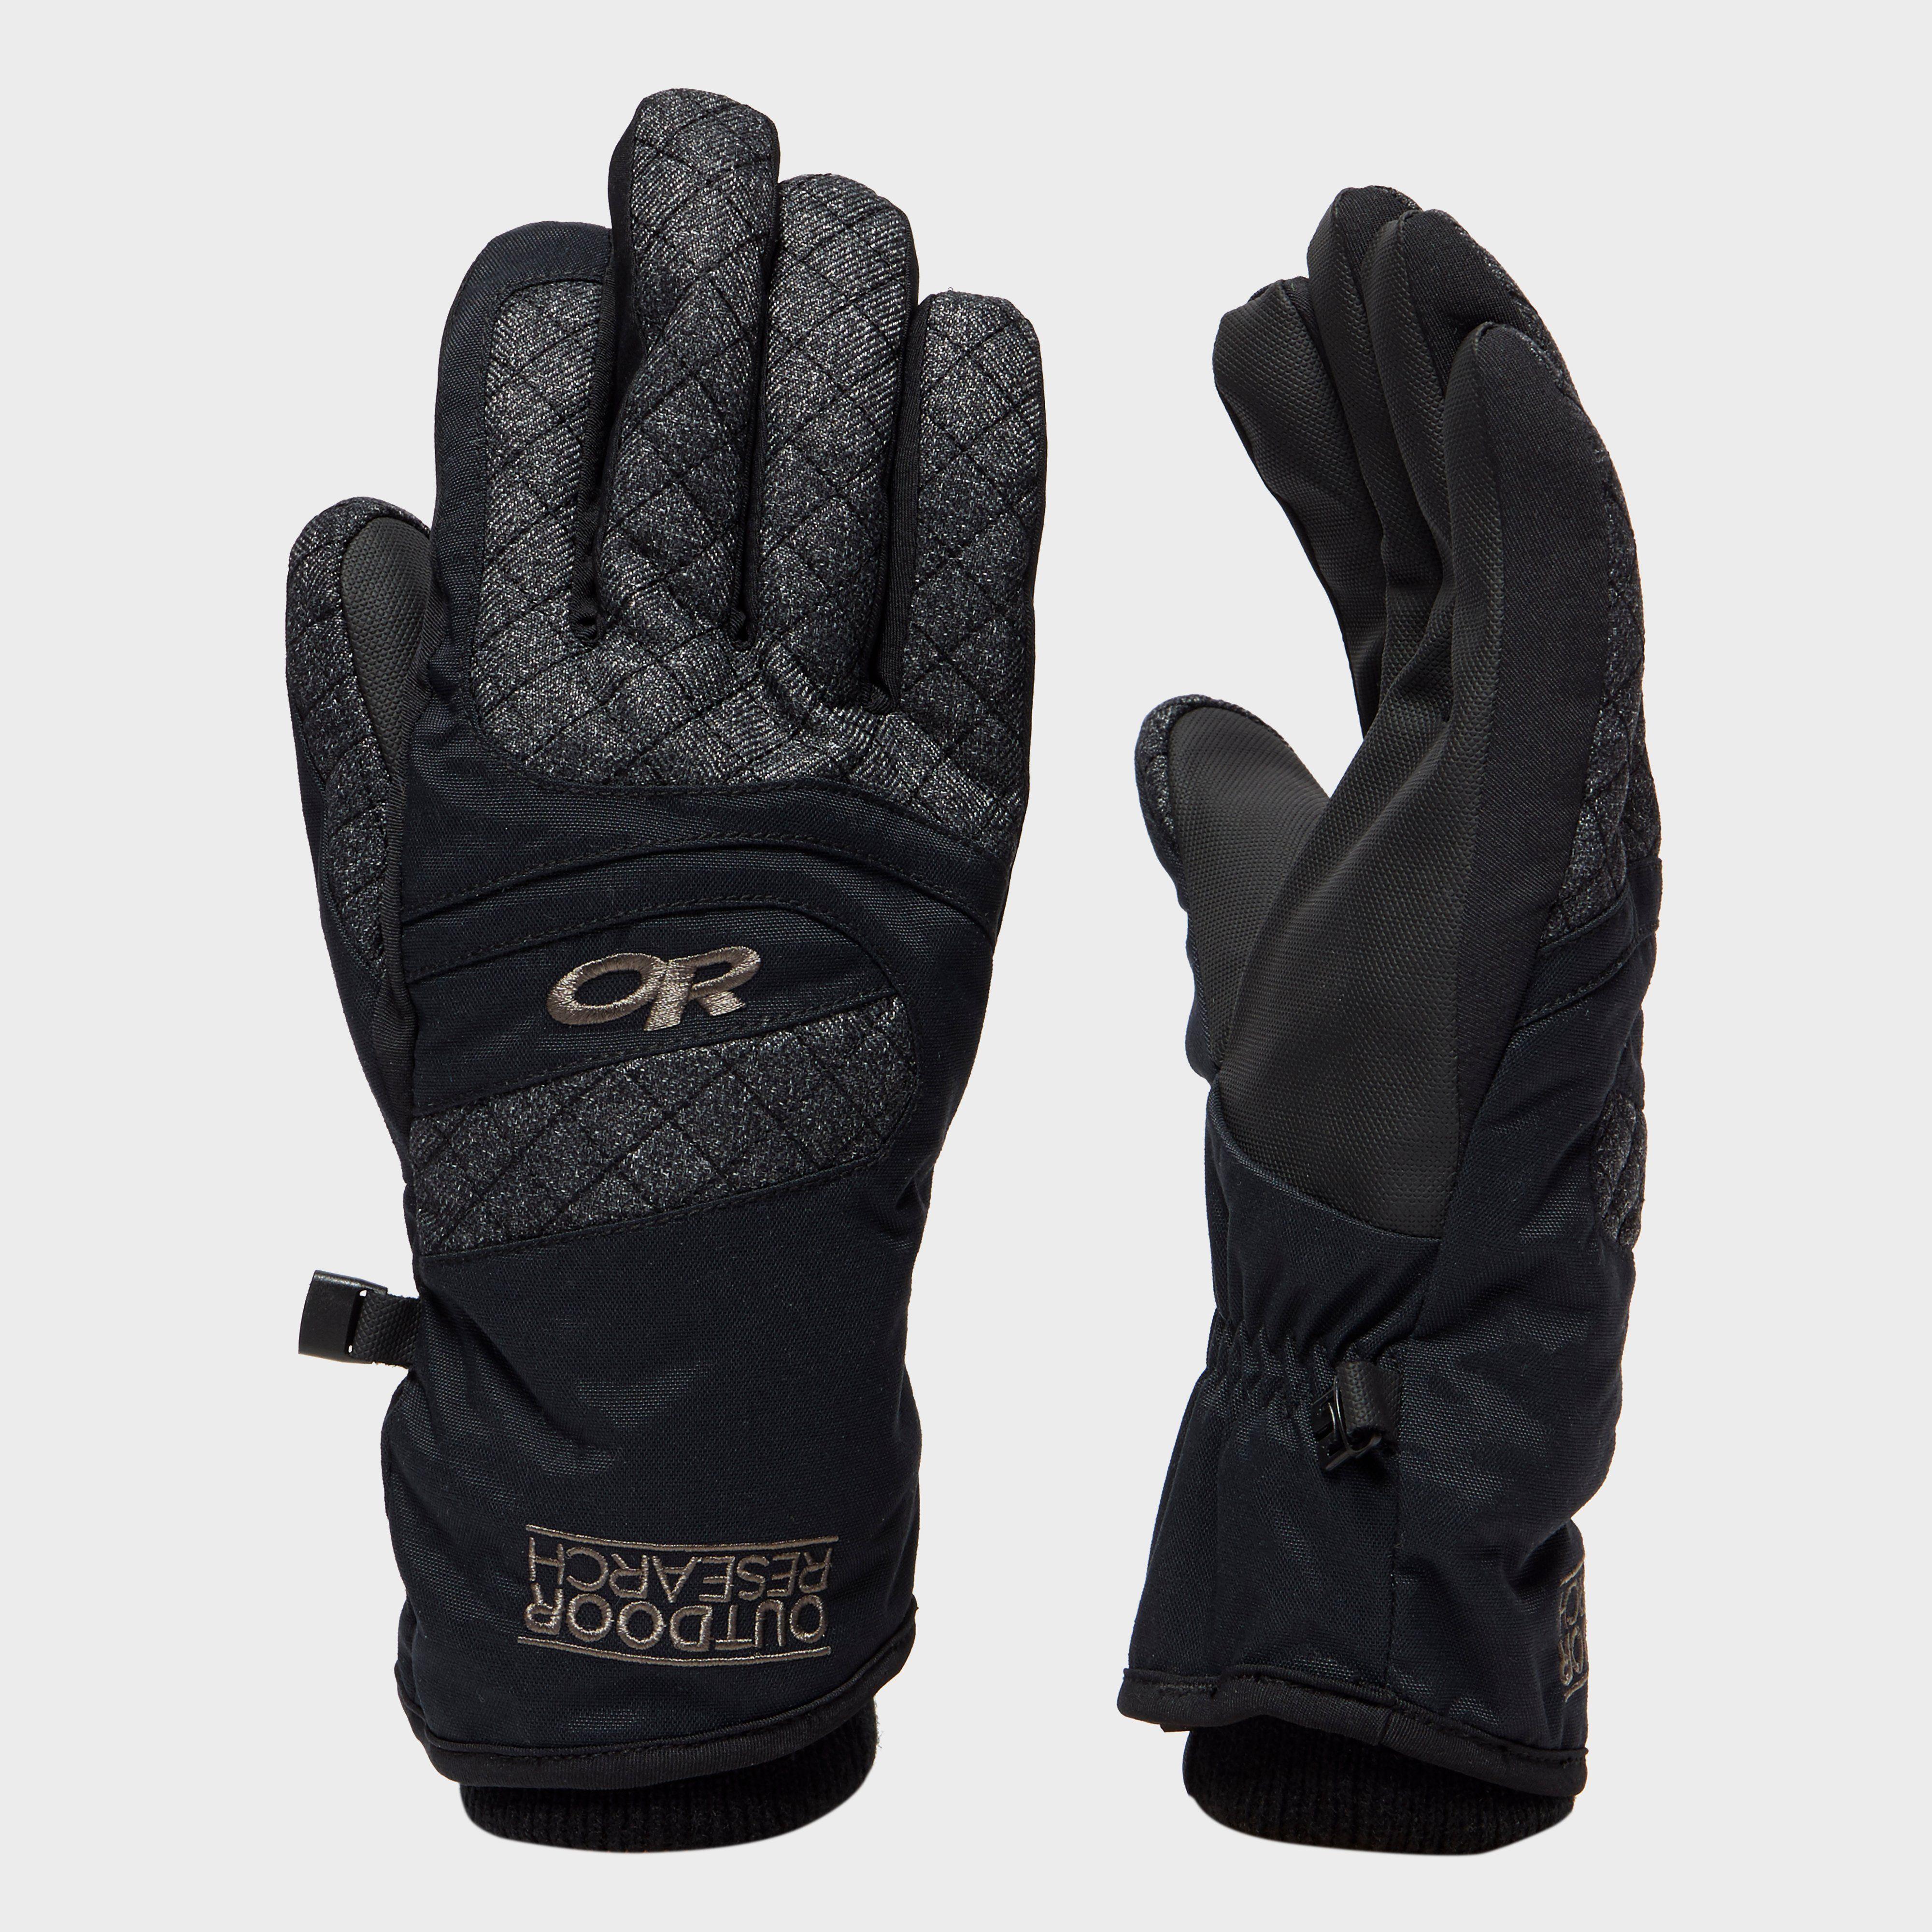 OUTDOOR RESEARCH Women's Riot Glove